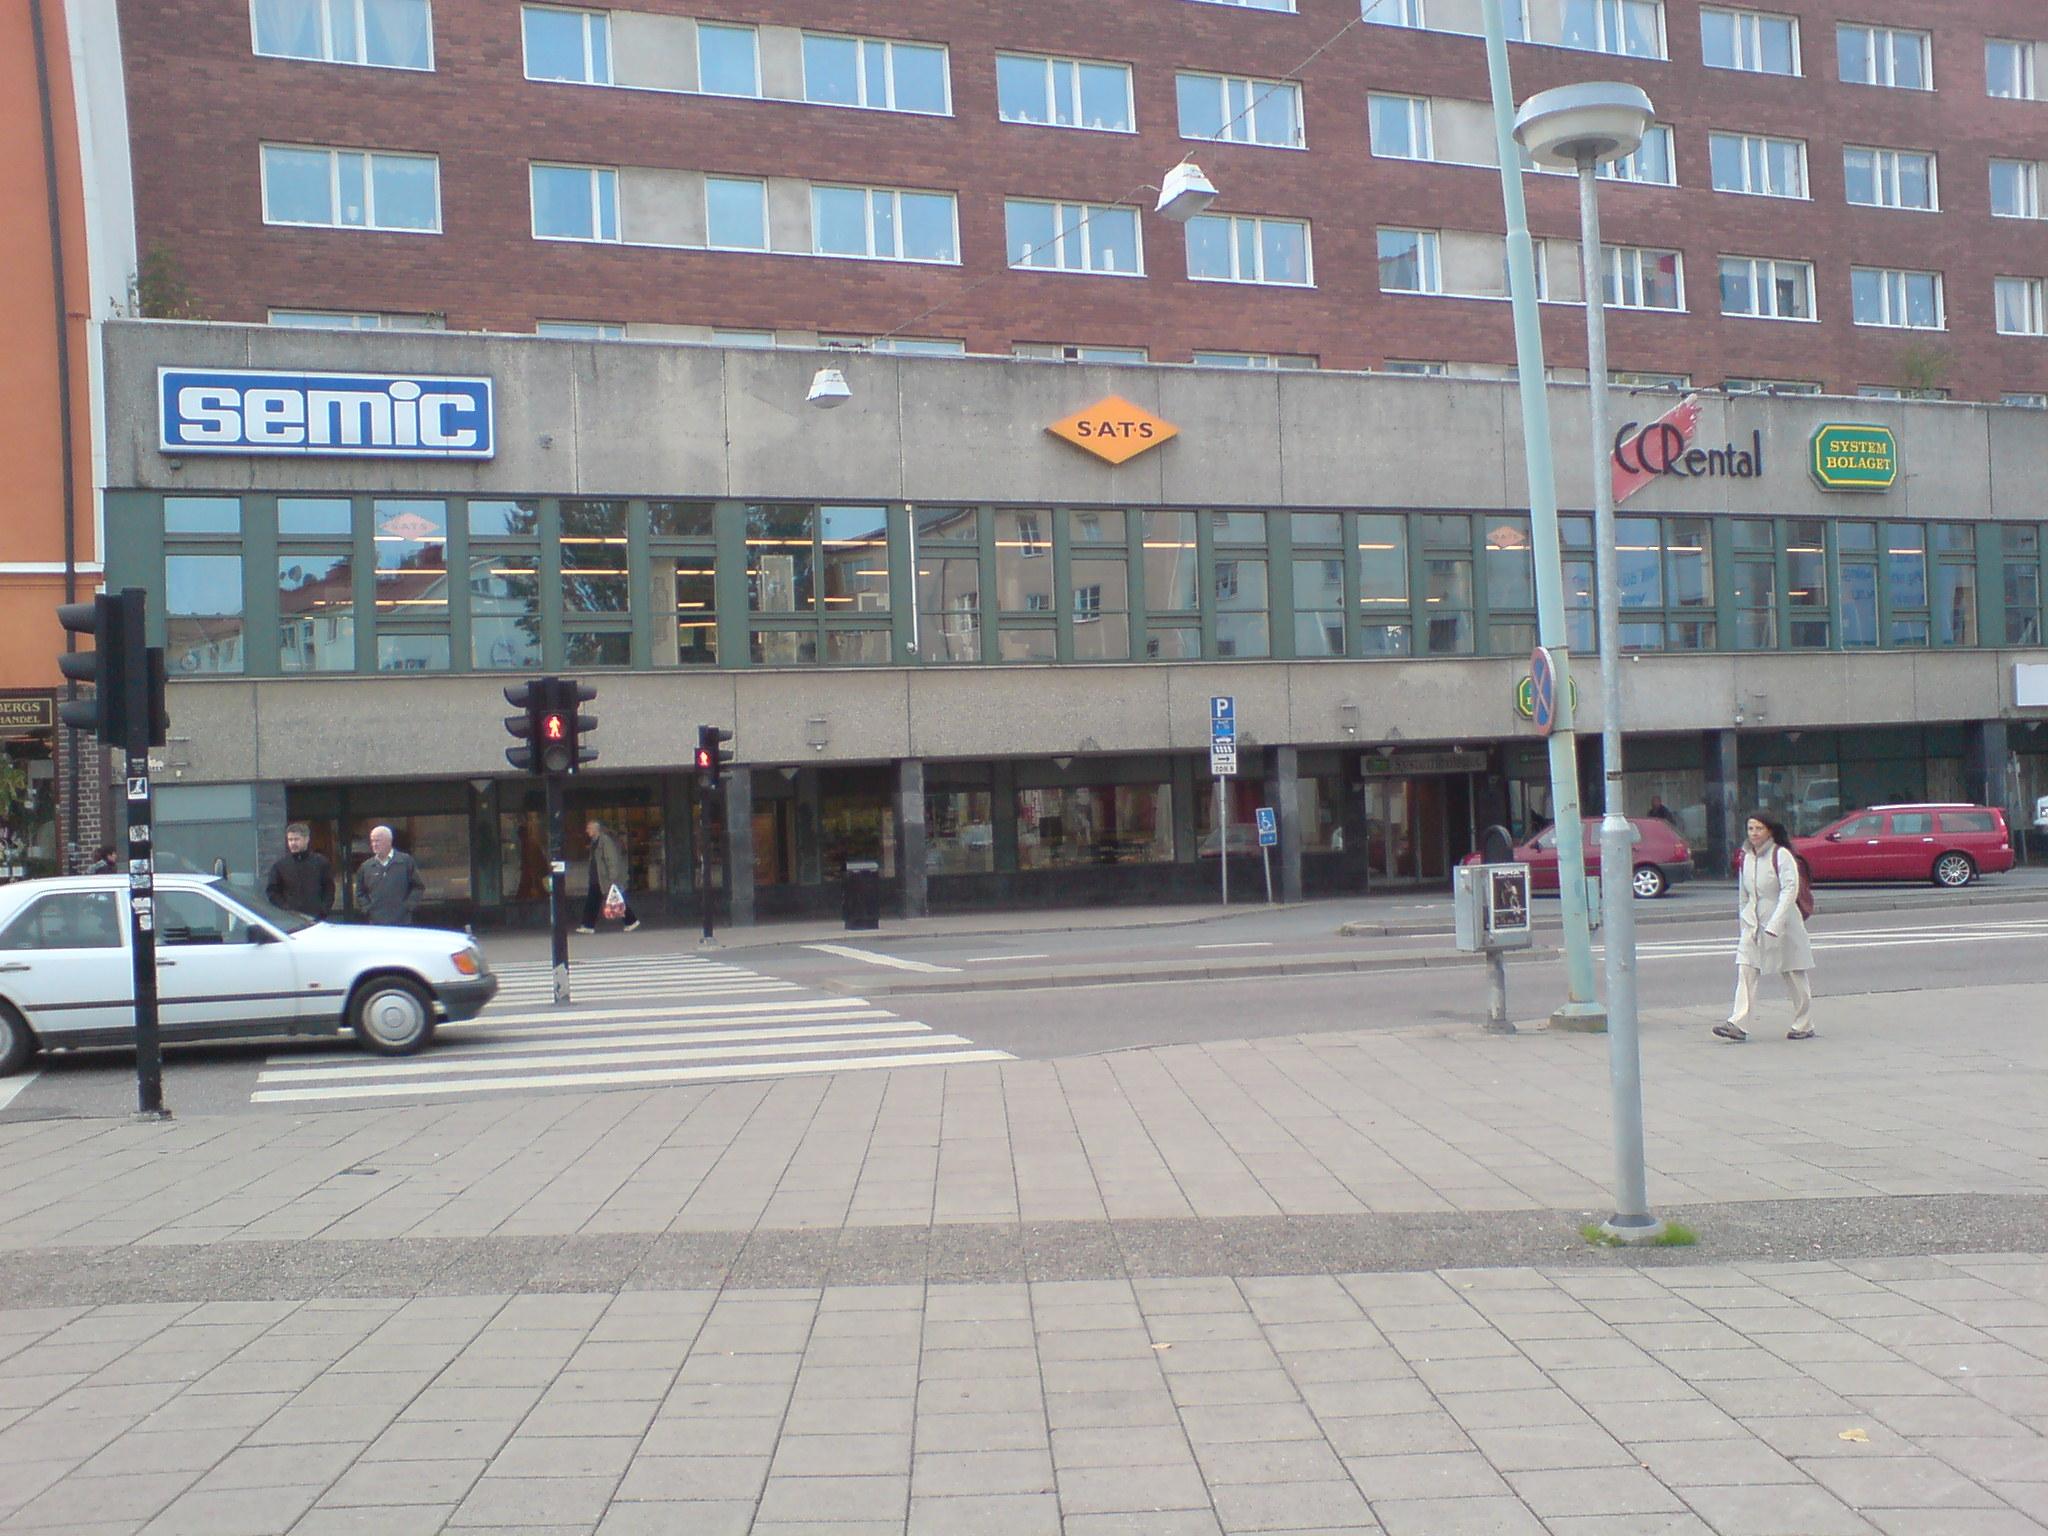 SATS Sundbyberg